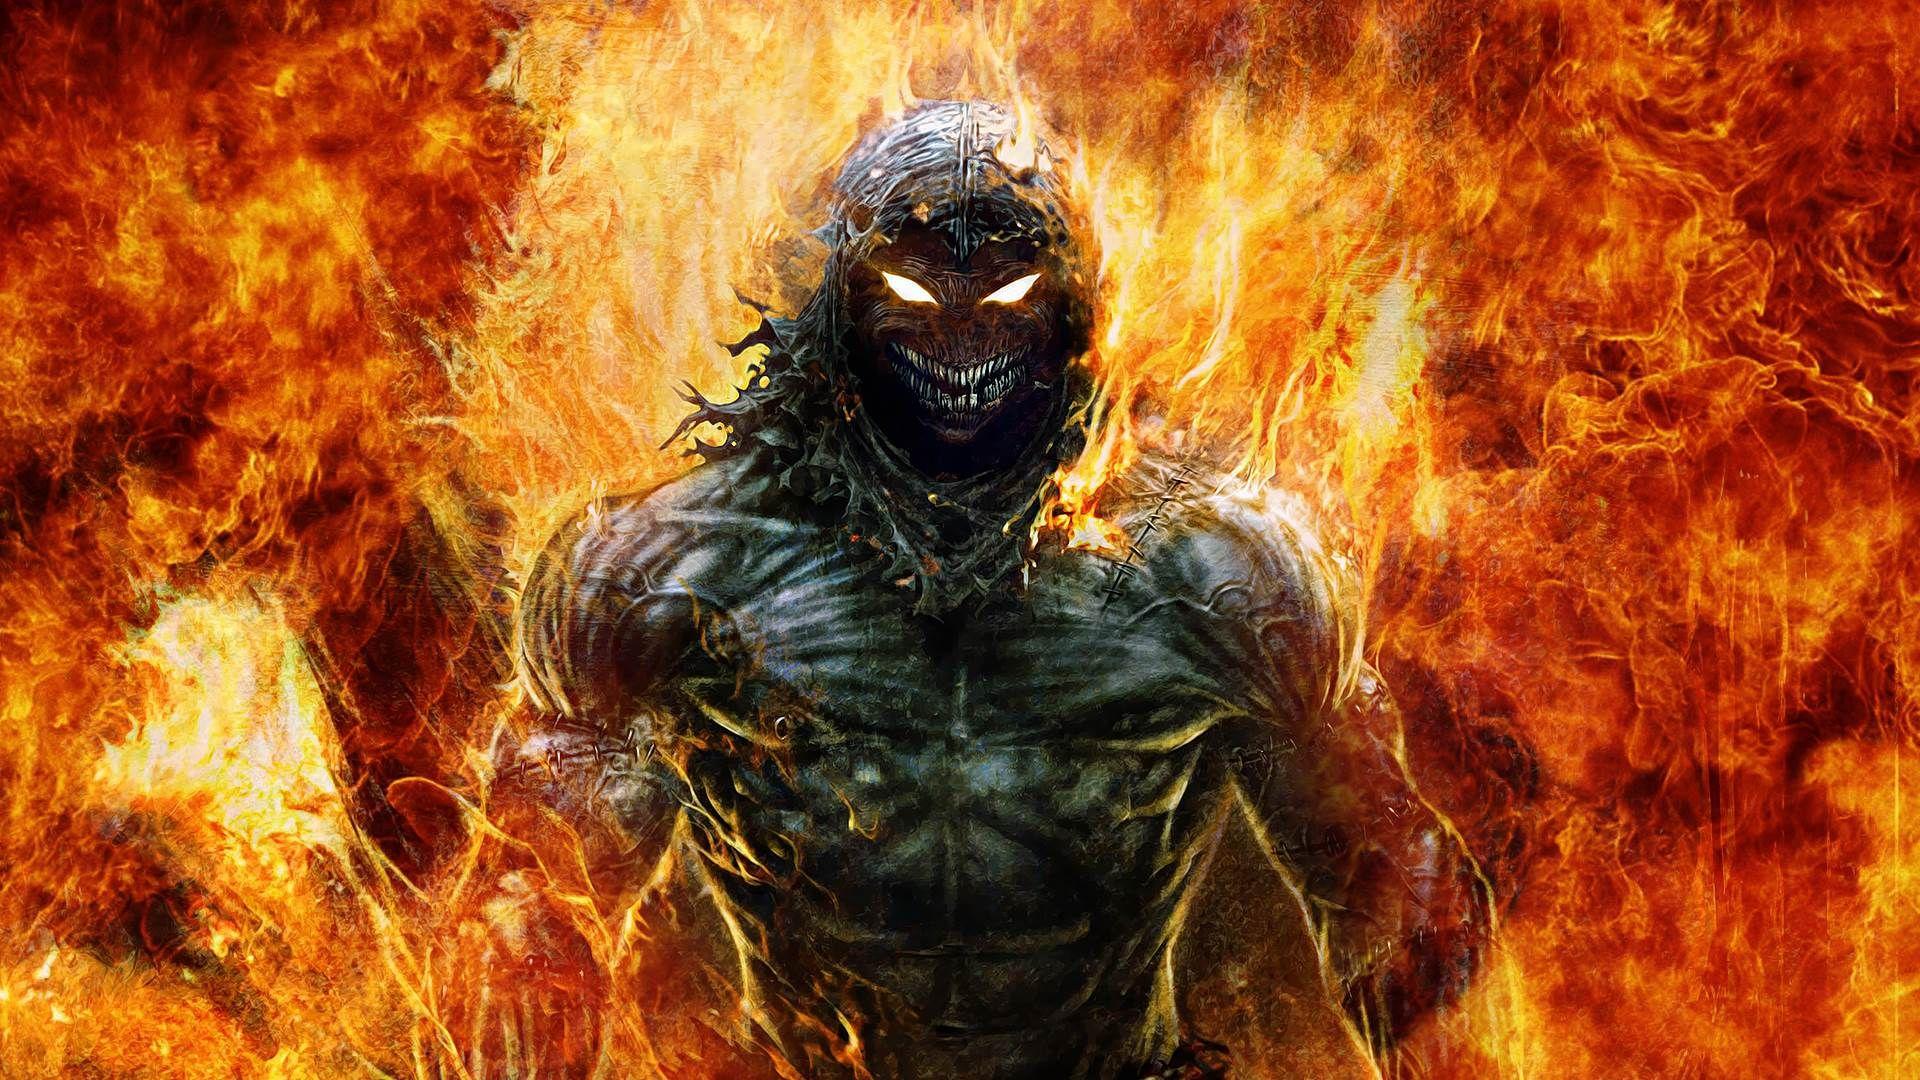 Demon Lord Summoning Light Wallpaper From Demon Wallpapers Art